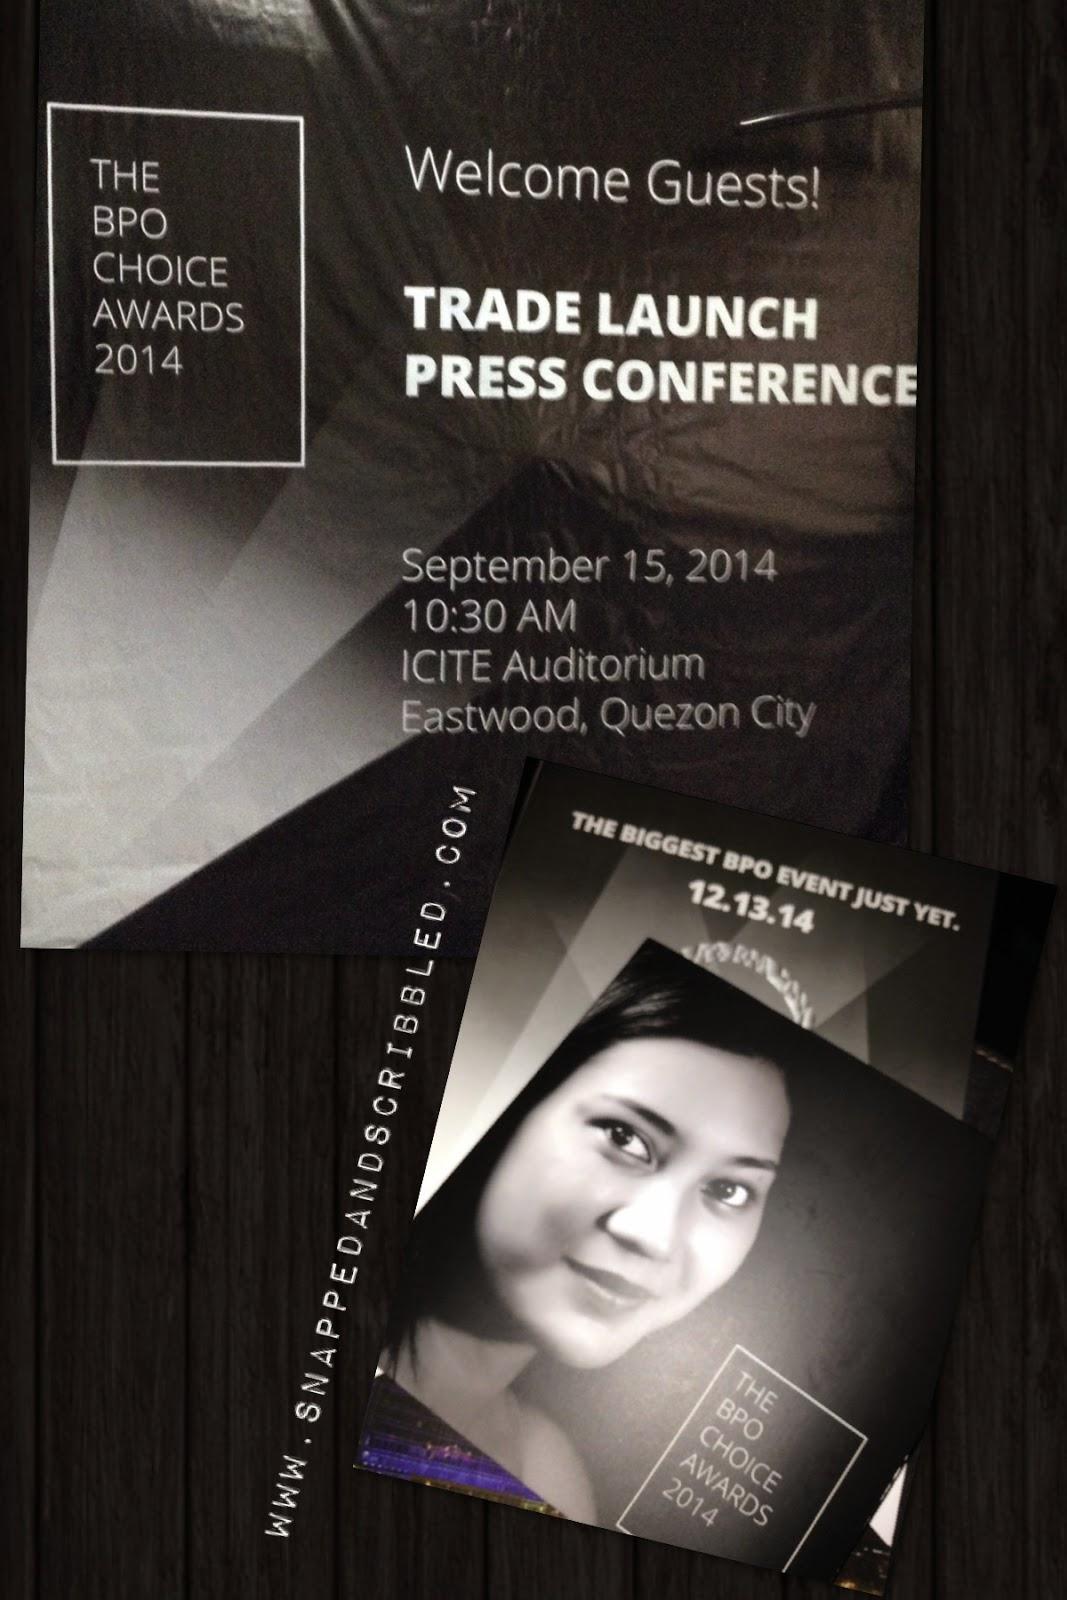 The BPO Choice Awards 2014 Trade Launch Press Conference